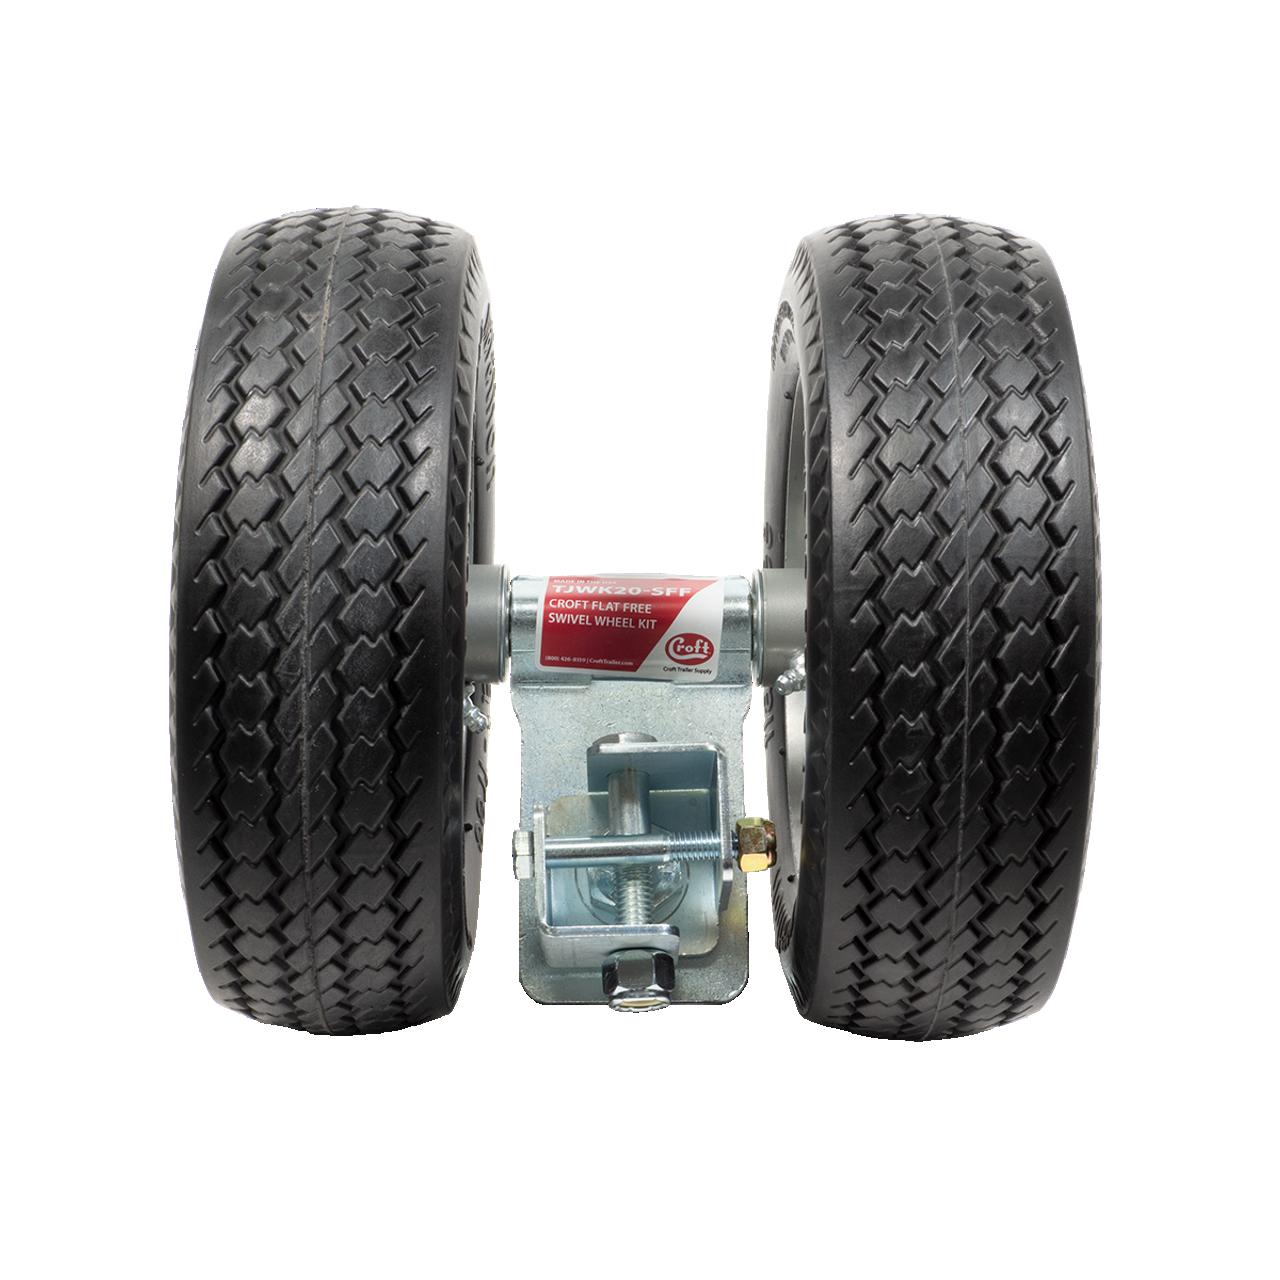 TJWK20-SFF --- Croft Flat-Free Wheel Kit with Swivel Feature